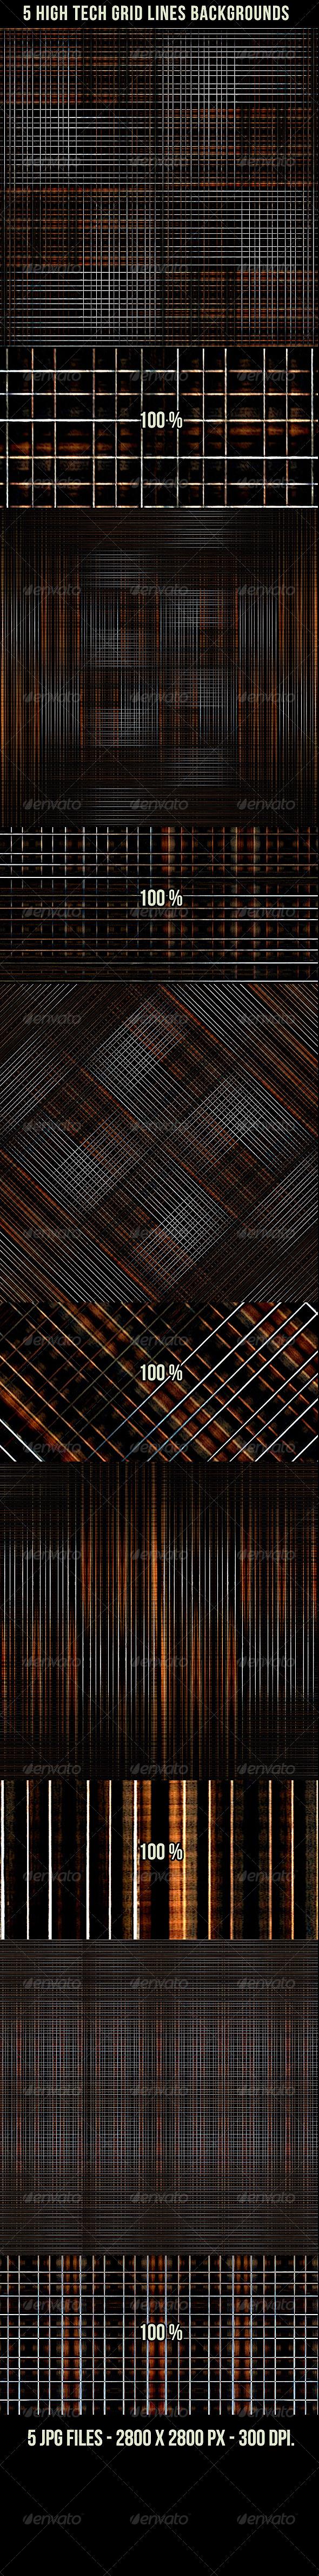 5 High Tech Grid Lines Backgrounds - Tech / Futuristic Backgrounds